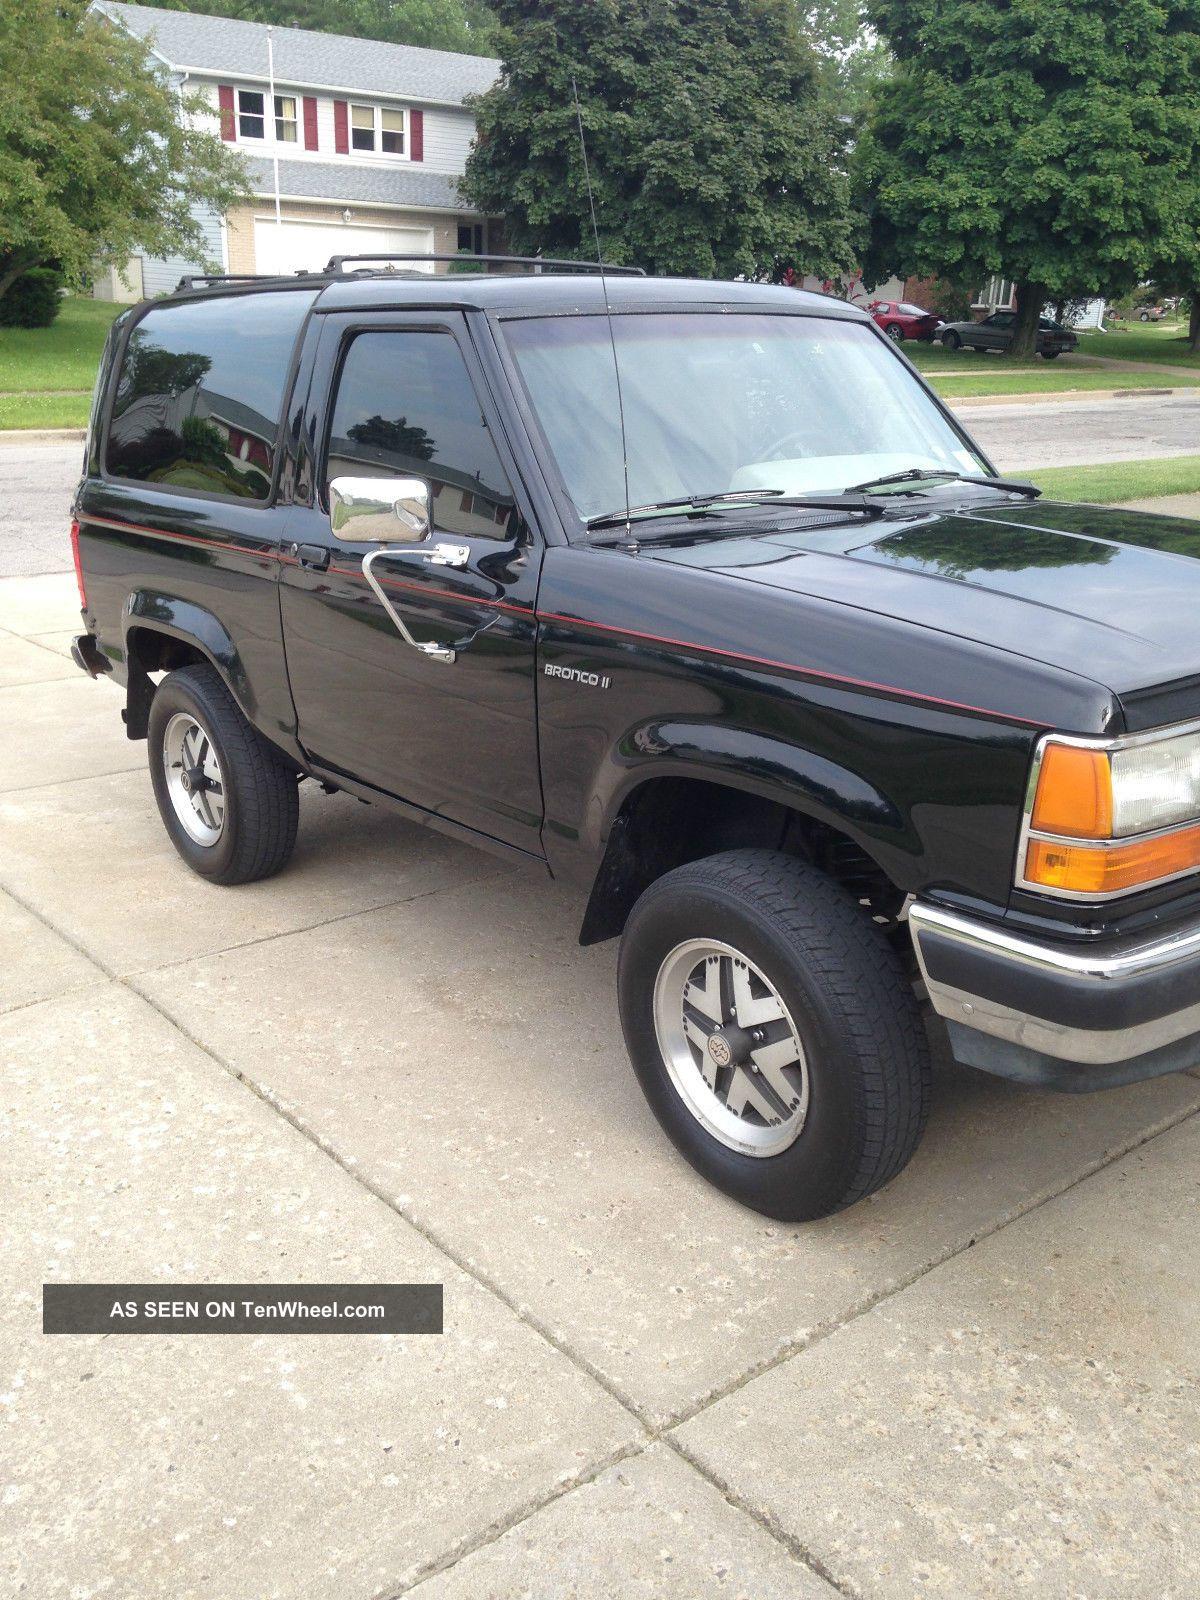 1989 Ford Bronco Ii 4x4 Eddie Bauer